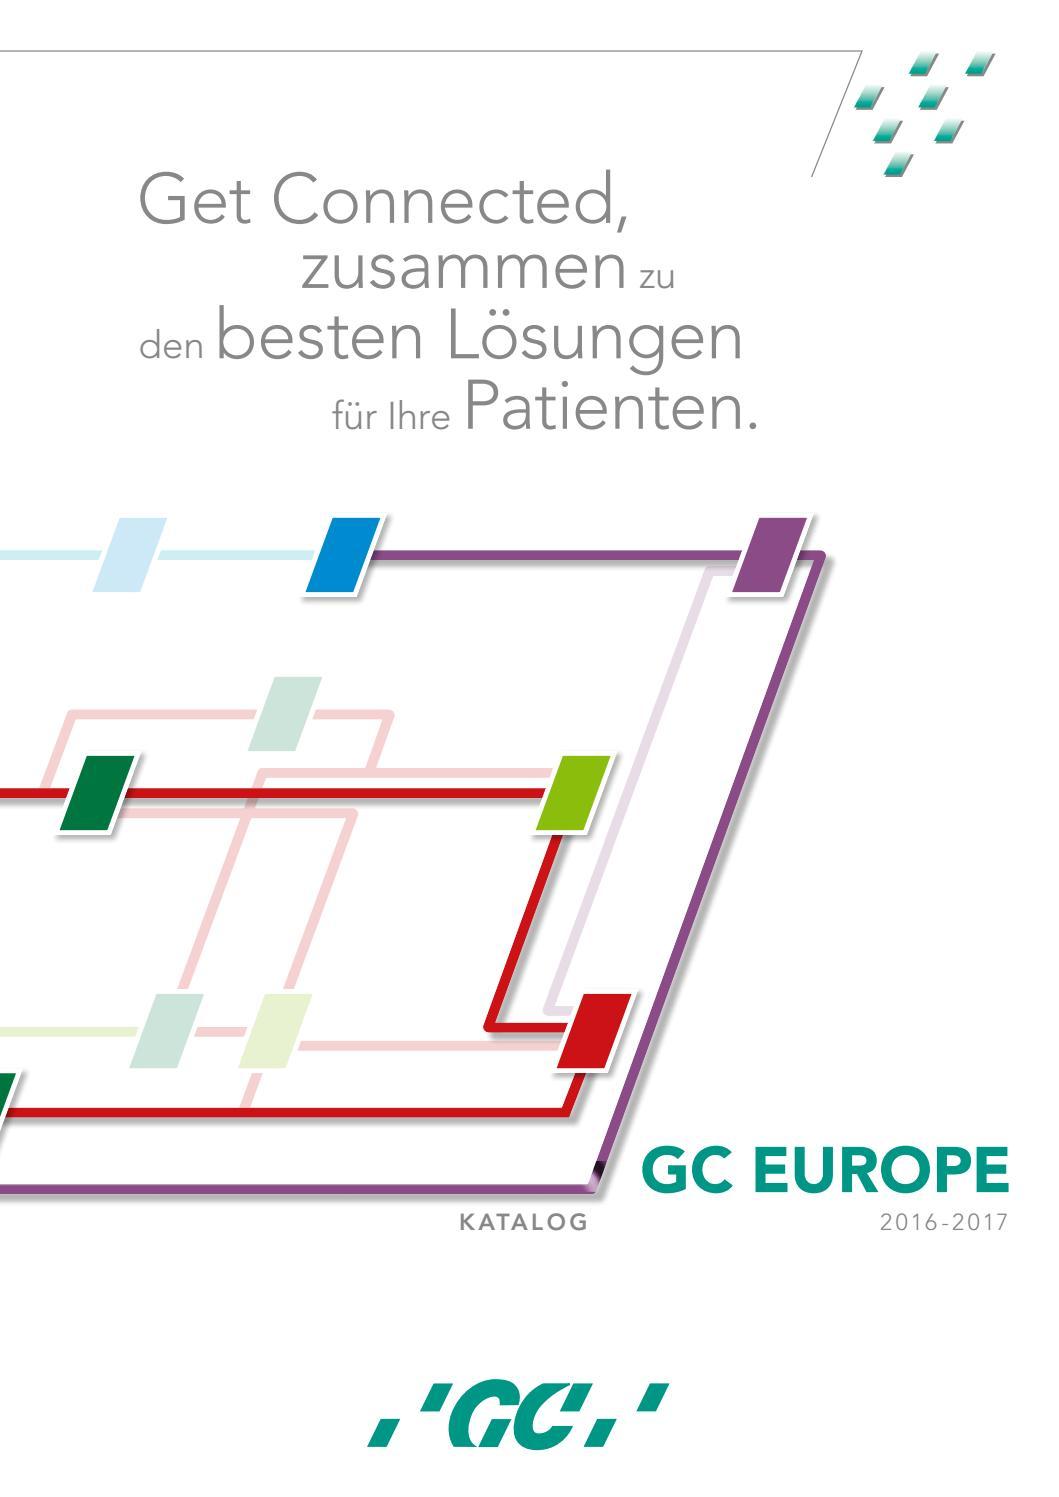 GC Europe Catalogue 2017-2018 German by GC Europe - issuu